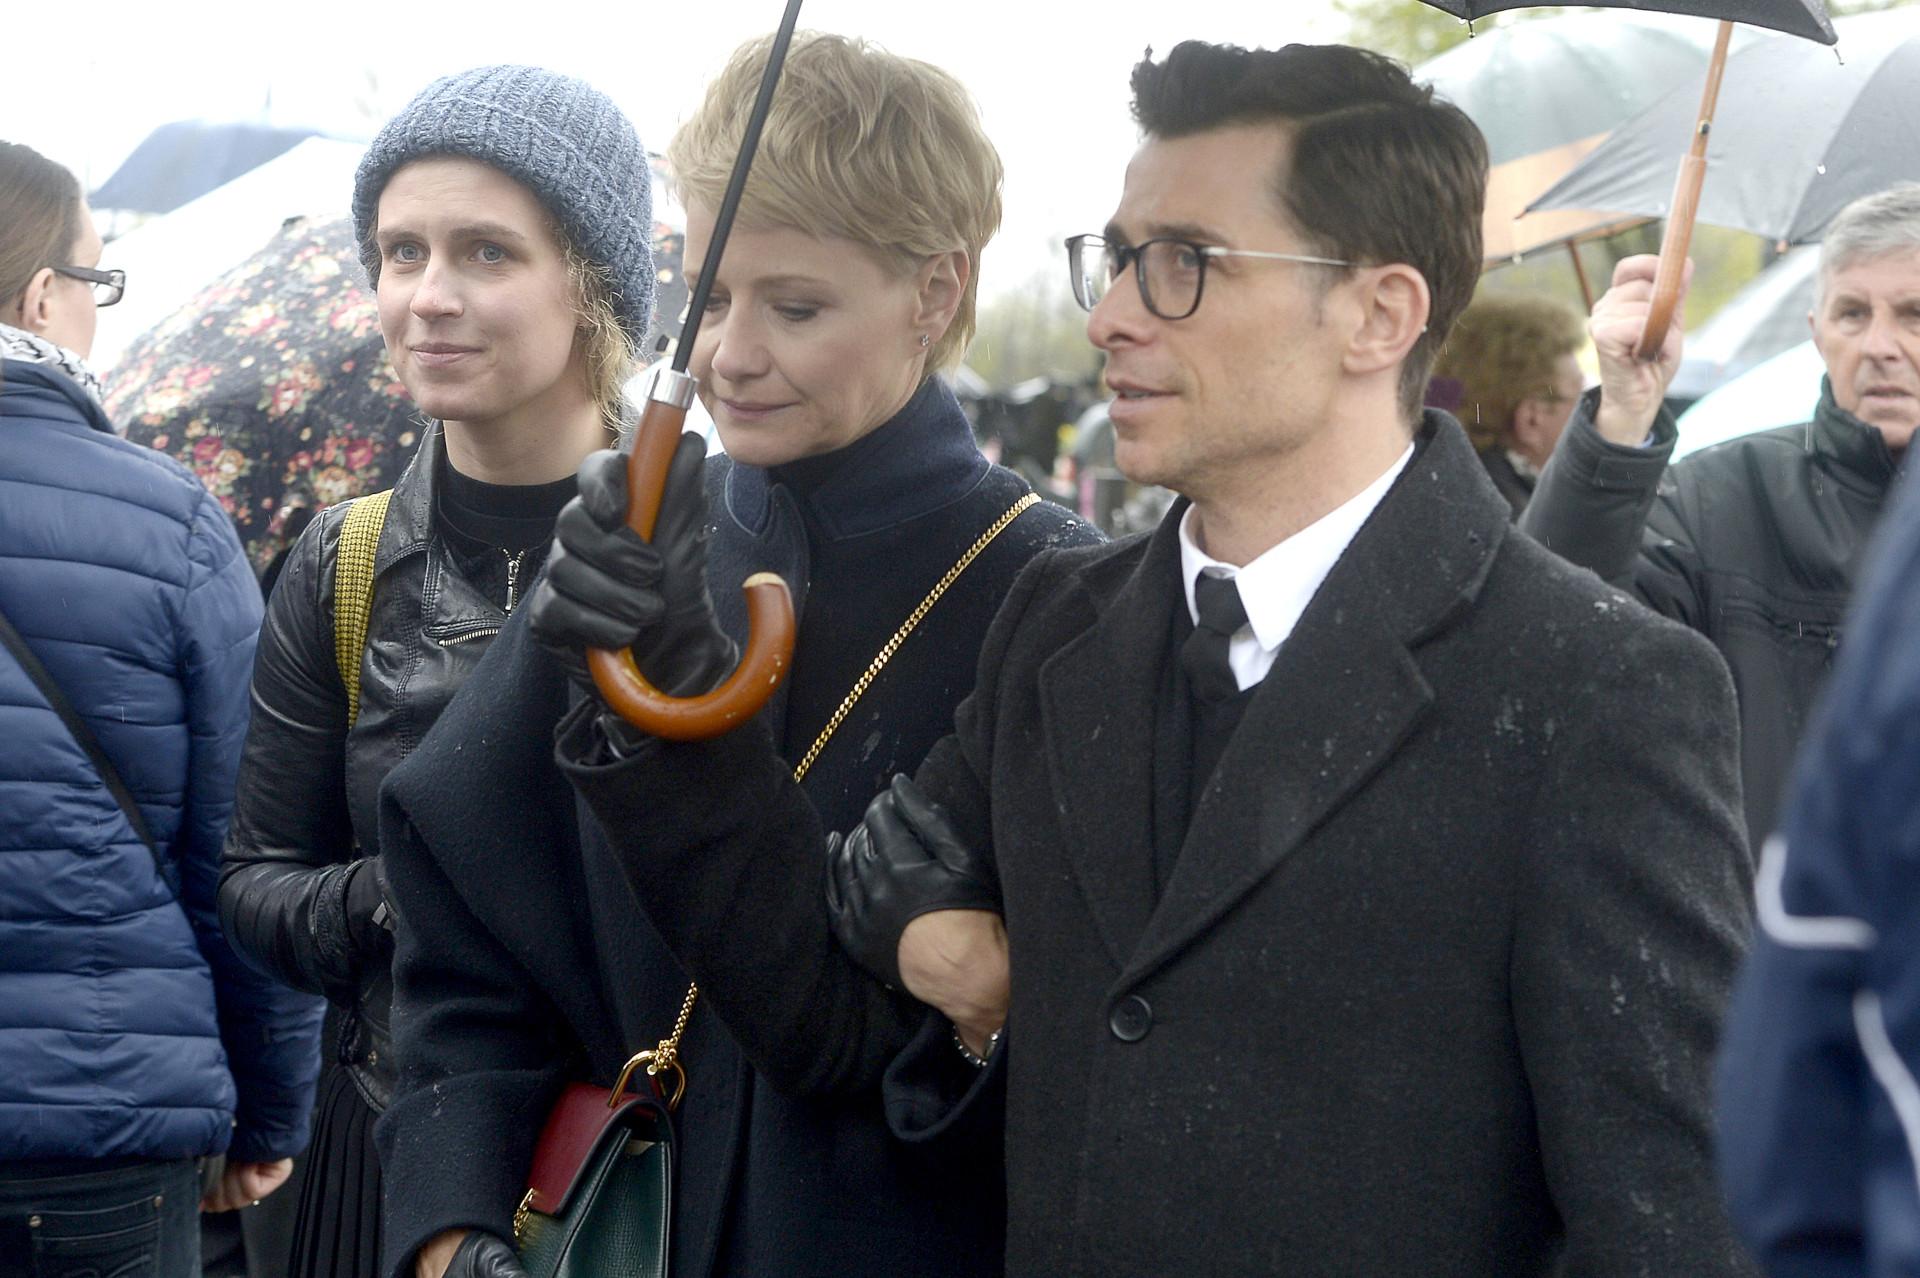 Marcjanna Lelek, Małgorzata Kożuchowska, Kacper Kuszewski, fot. Niemiec/AKPA